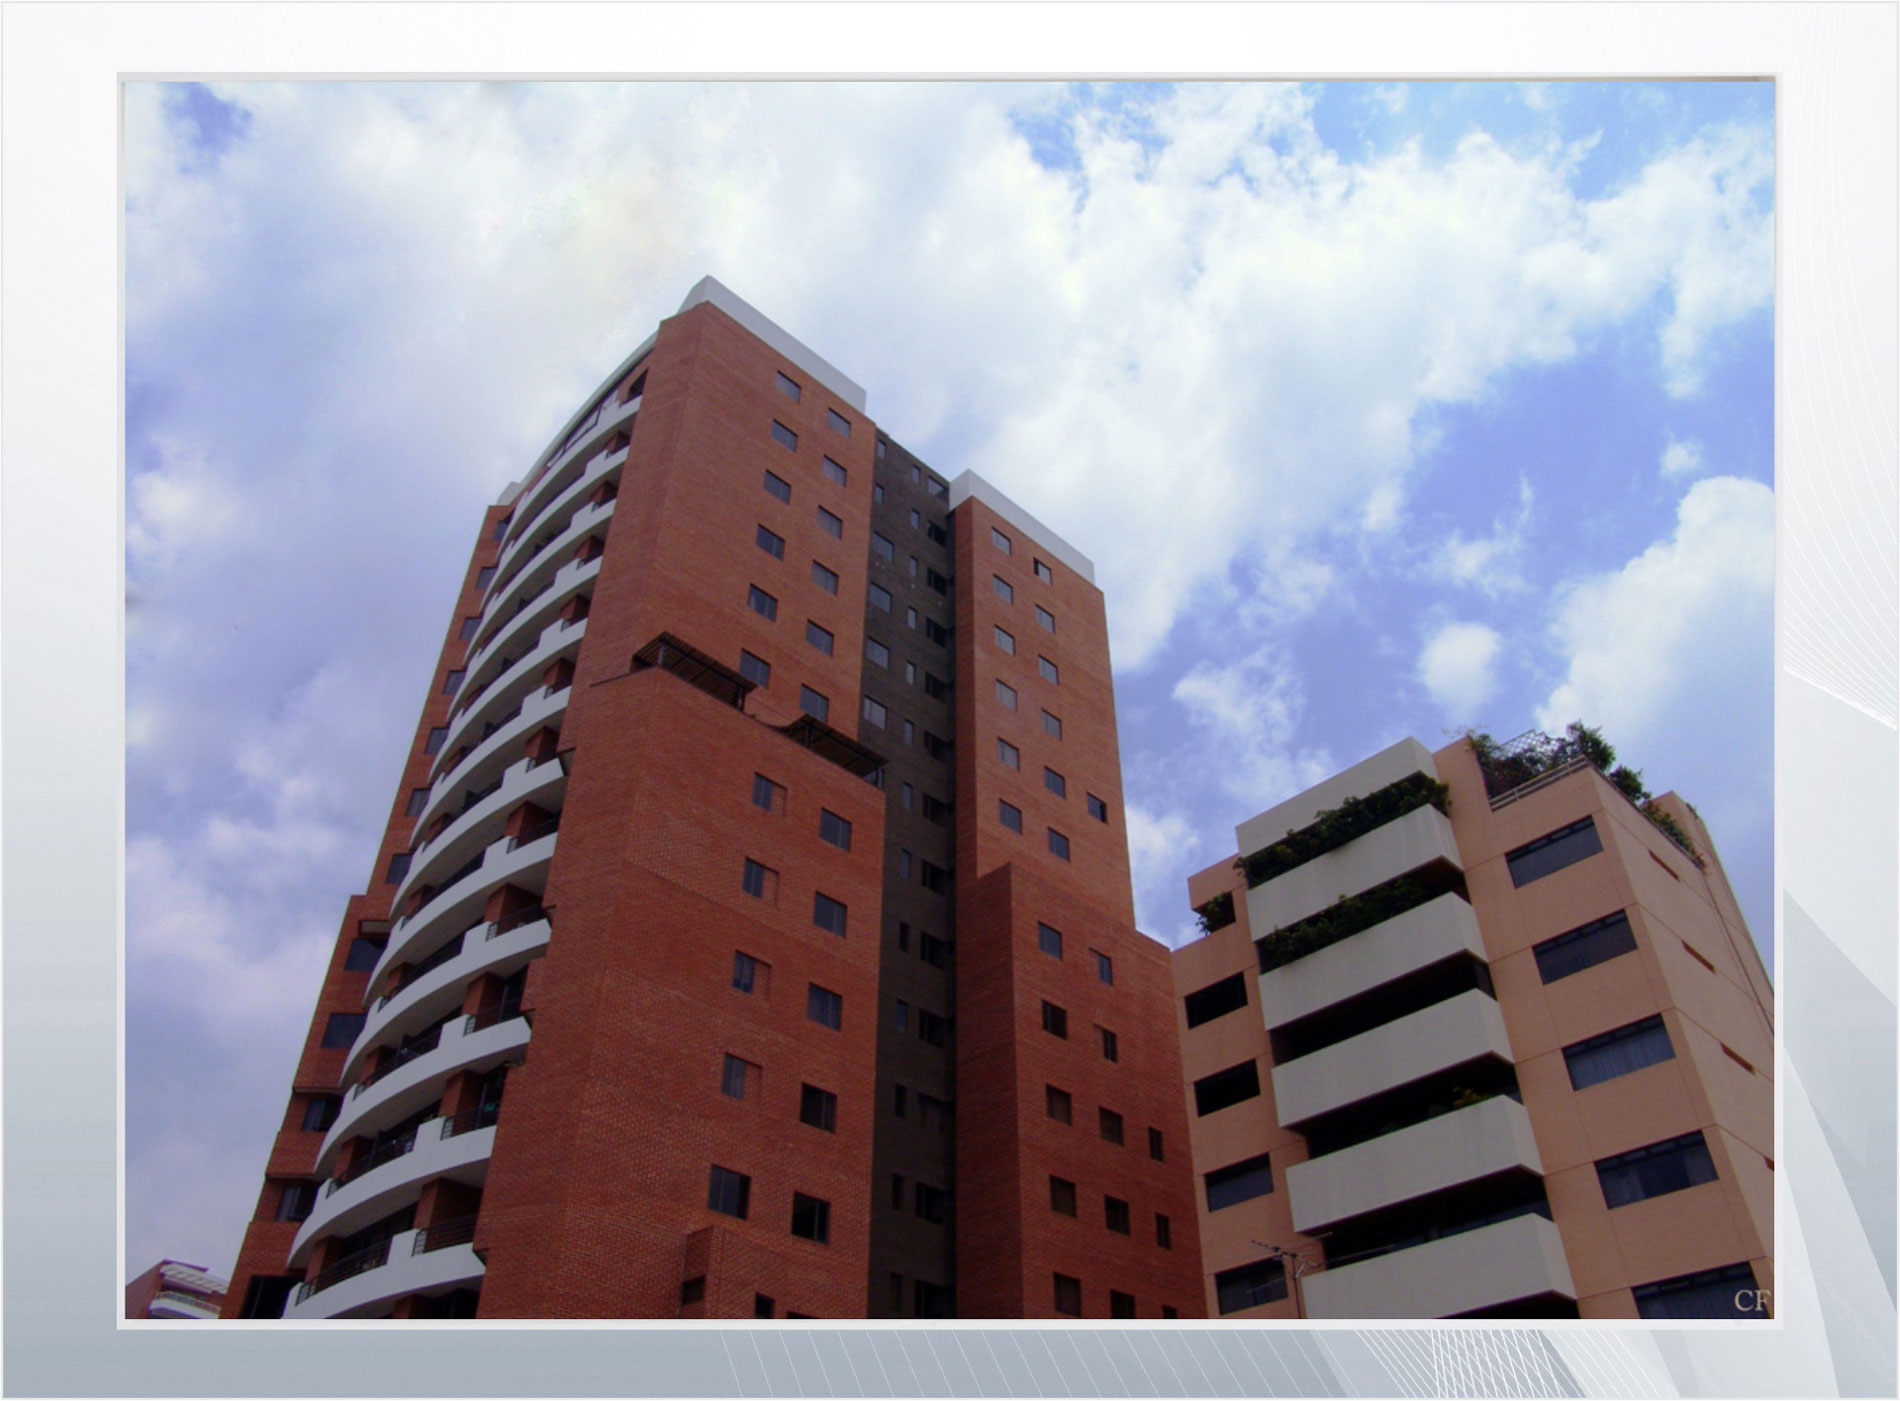 82_render_fachada_edificio_ggcm